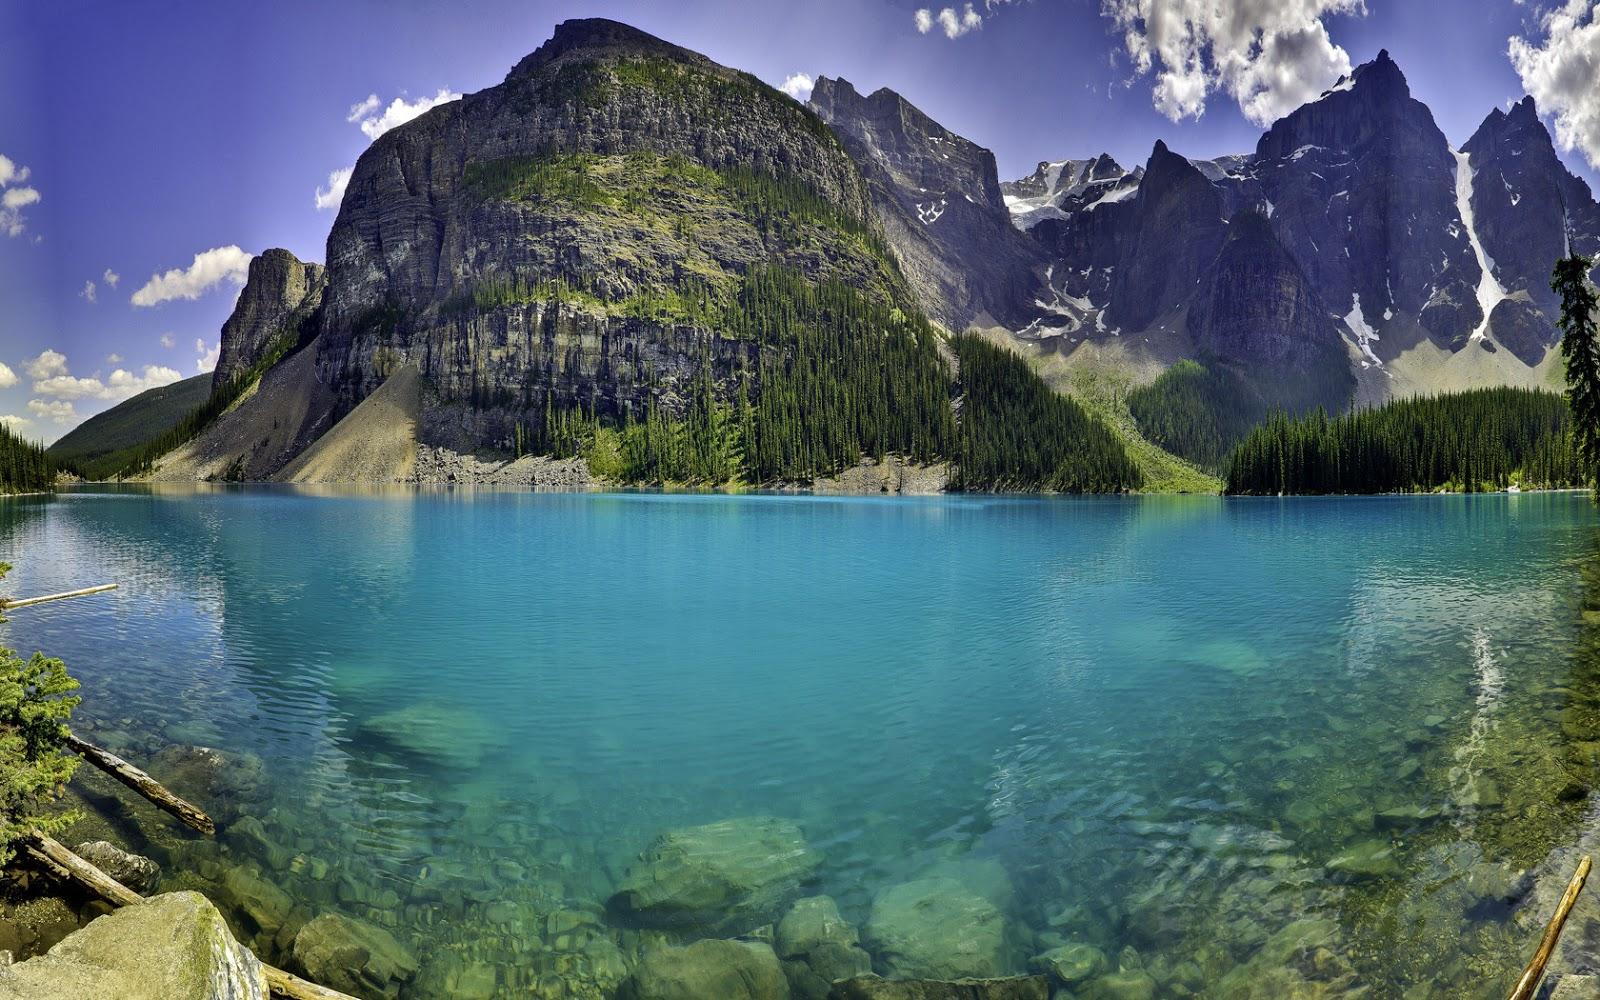 Lake Wallpapers